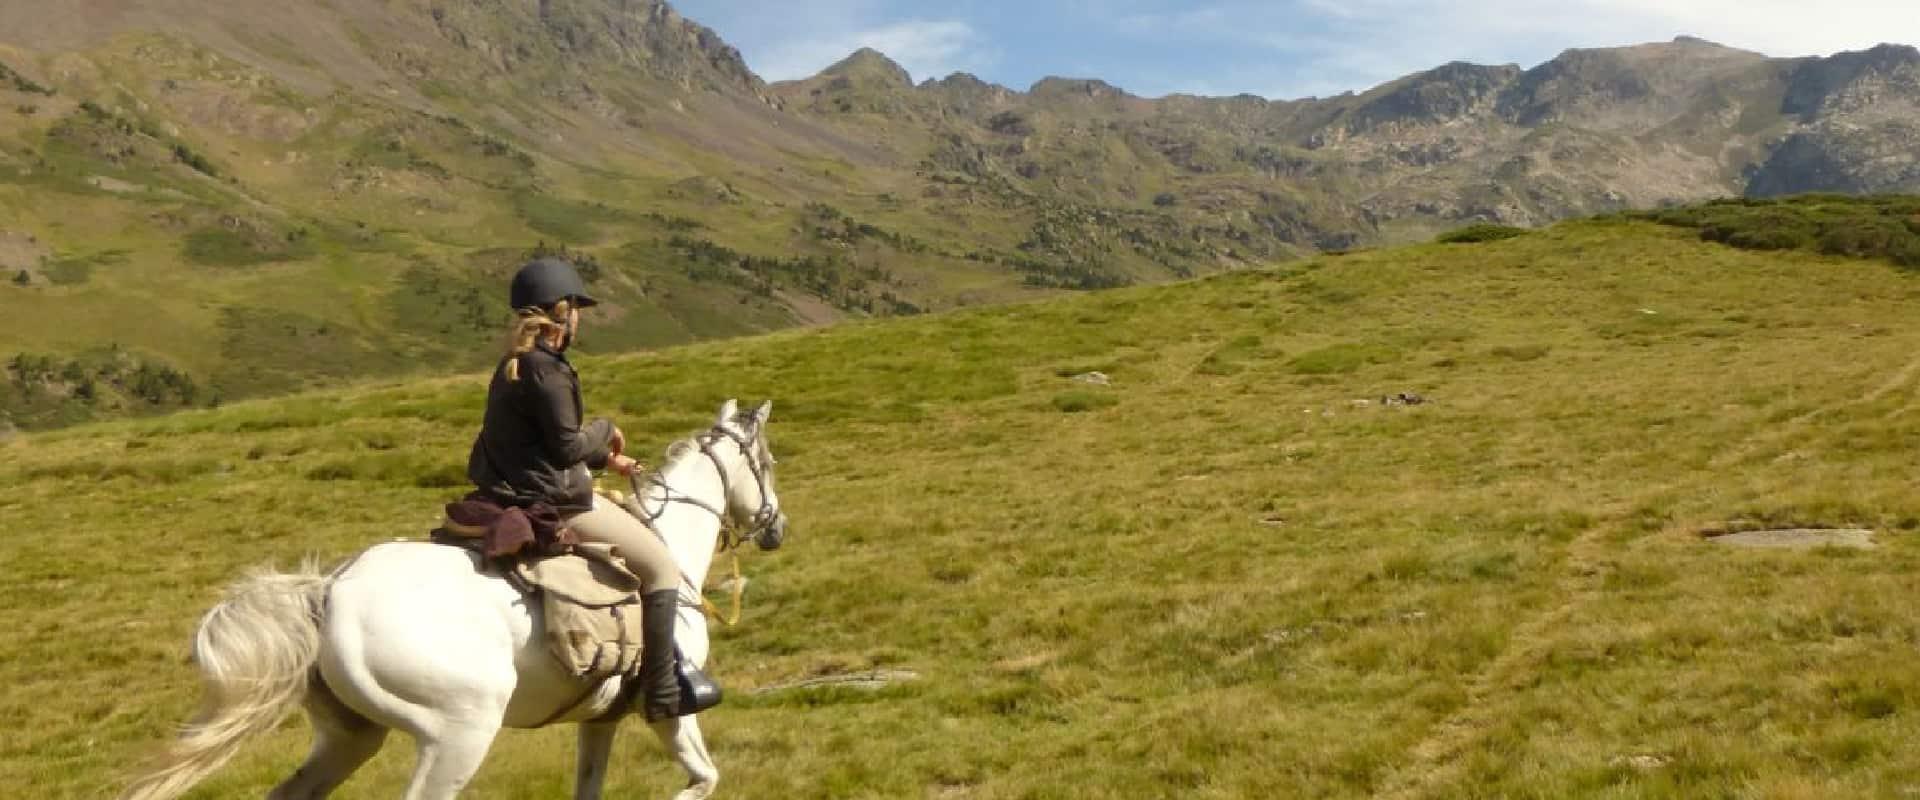 Les chevaux de la Tramontane